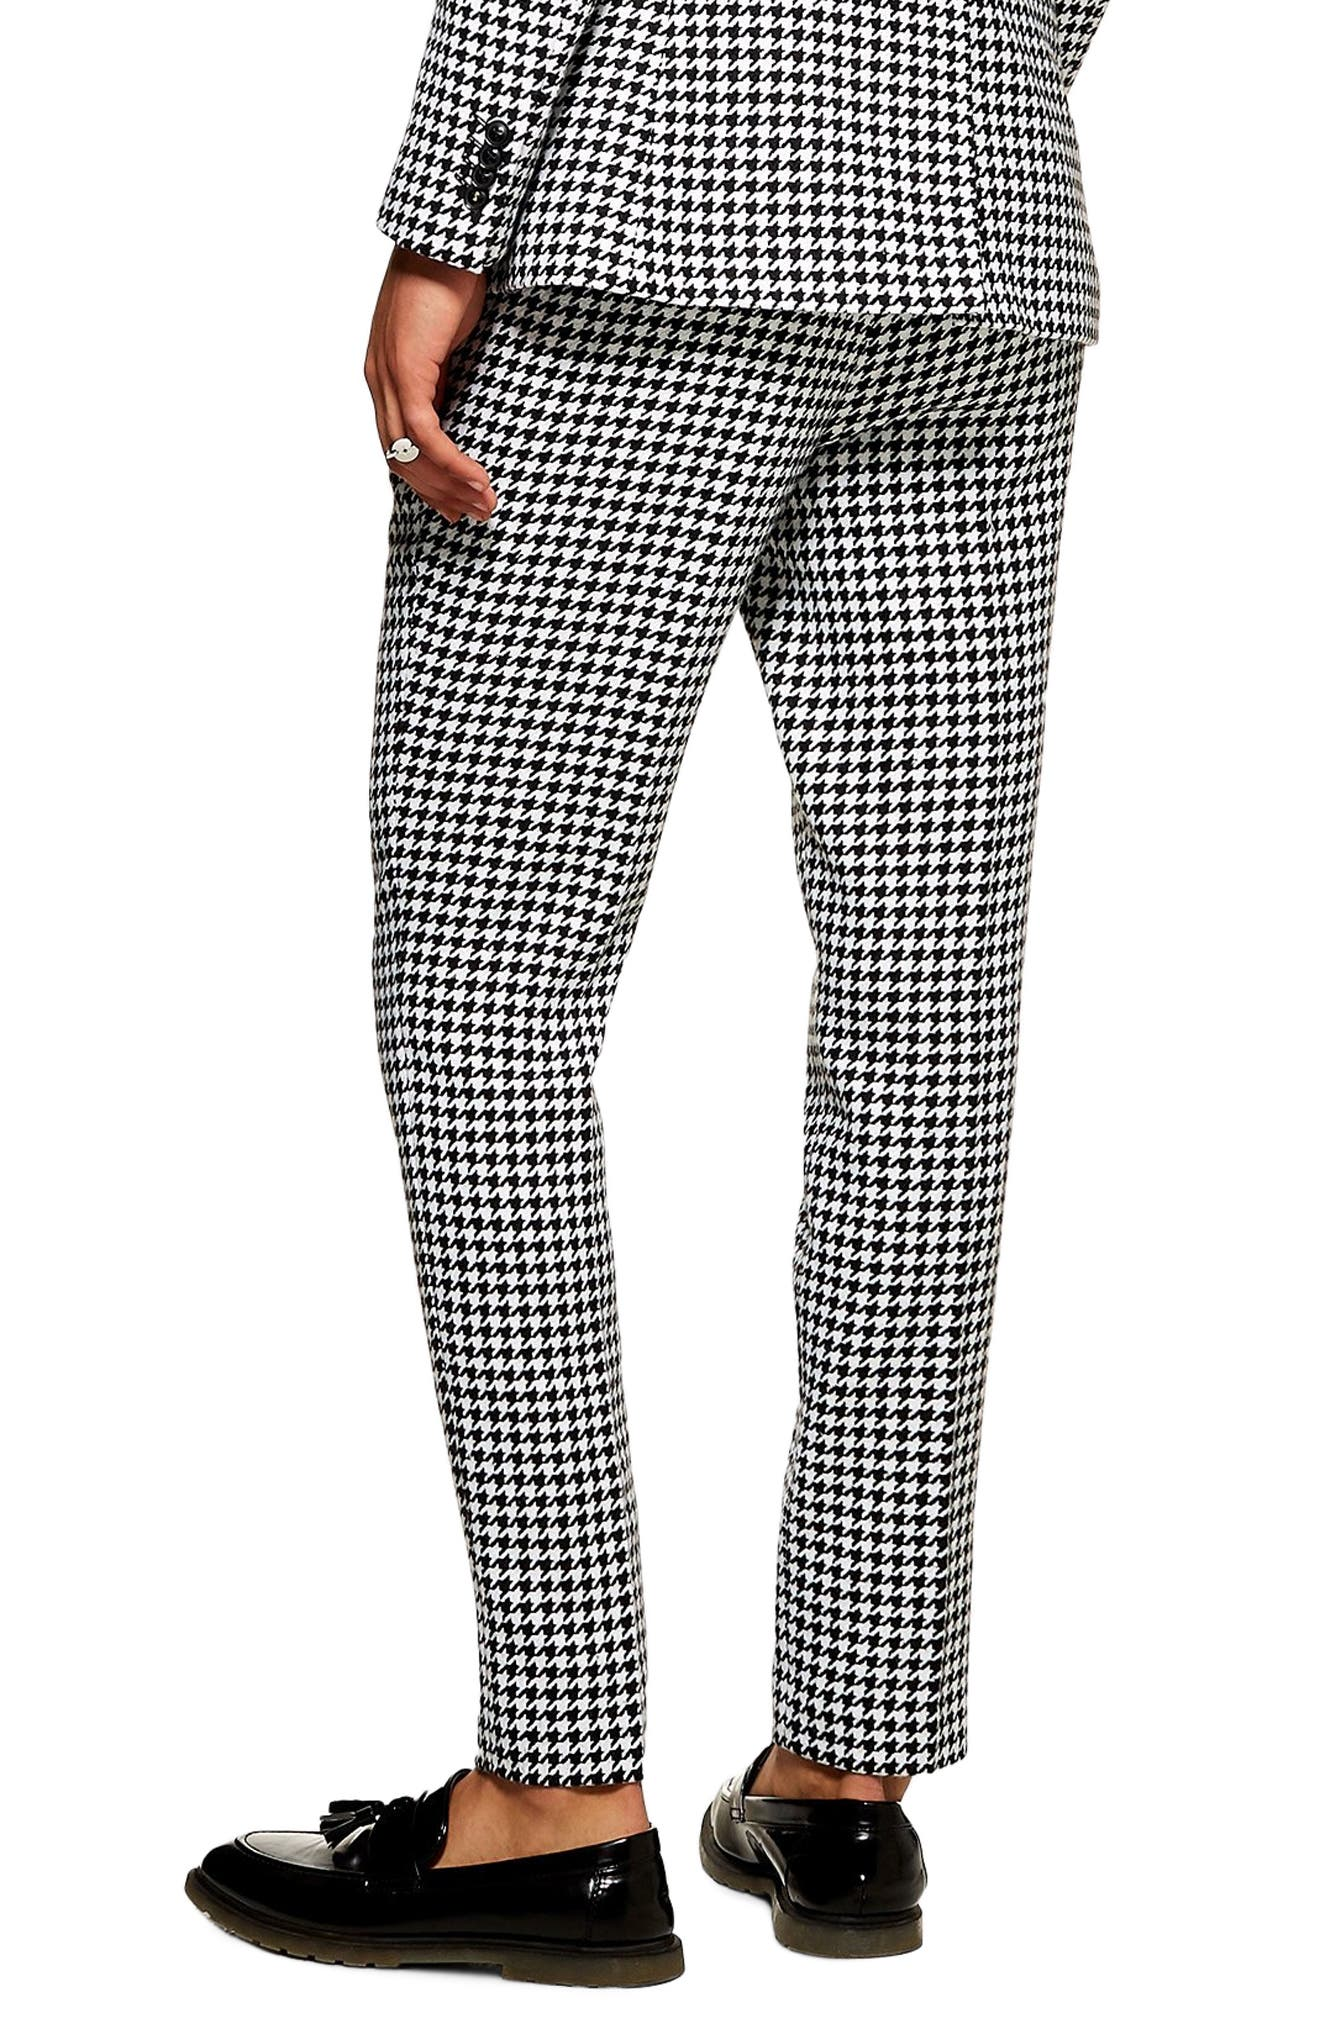 TOPMAN, Roe Skinny Fit Trousers, Alternate thumbnail 2, color, 001